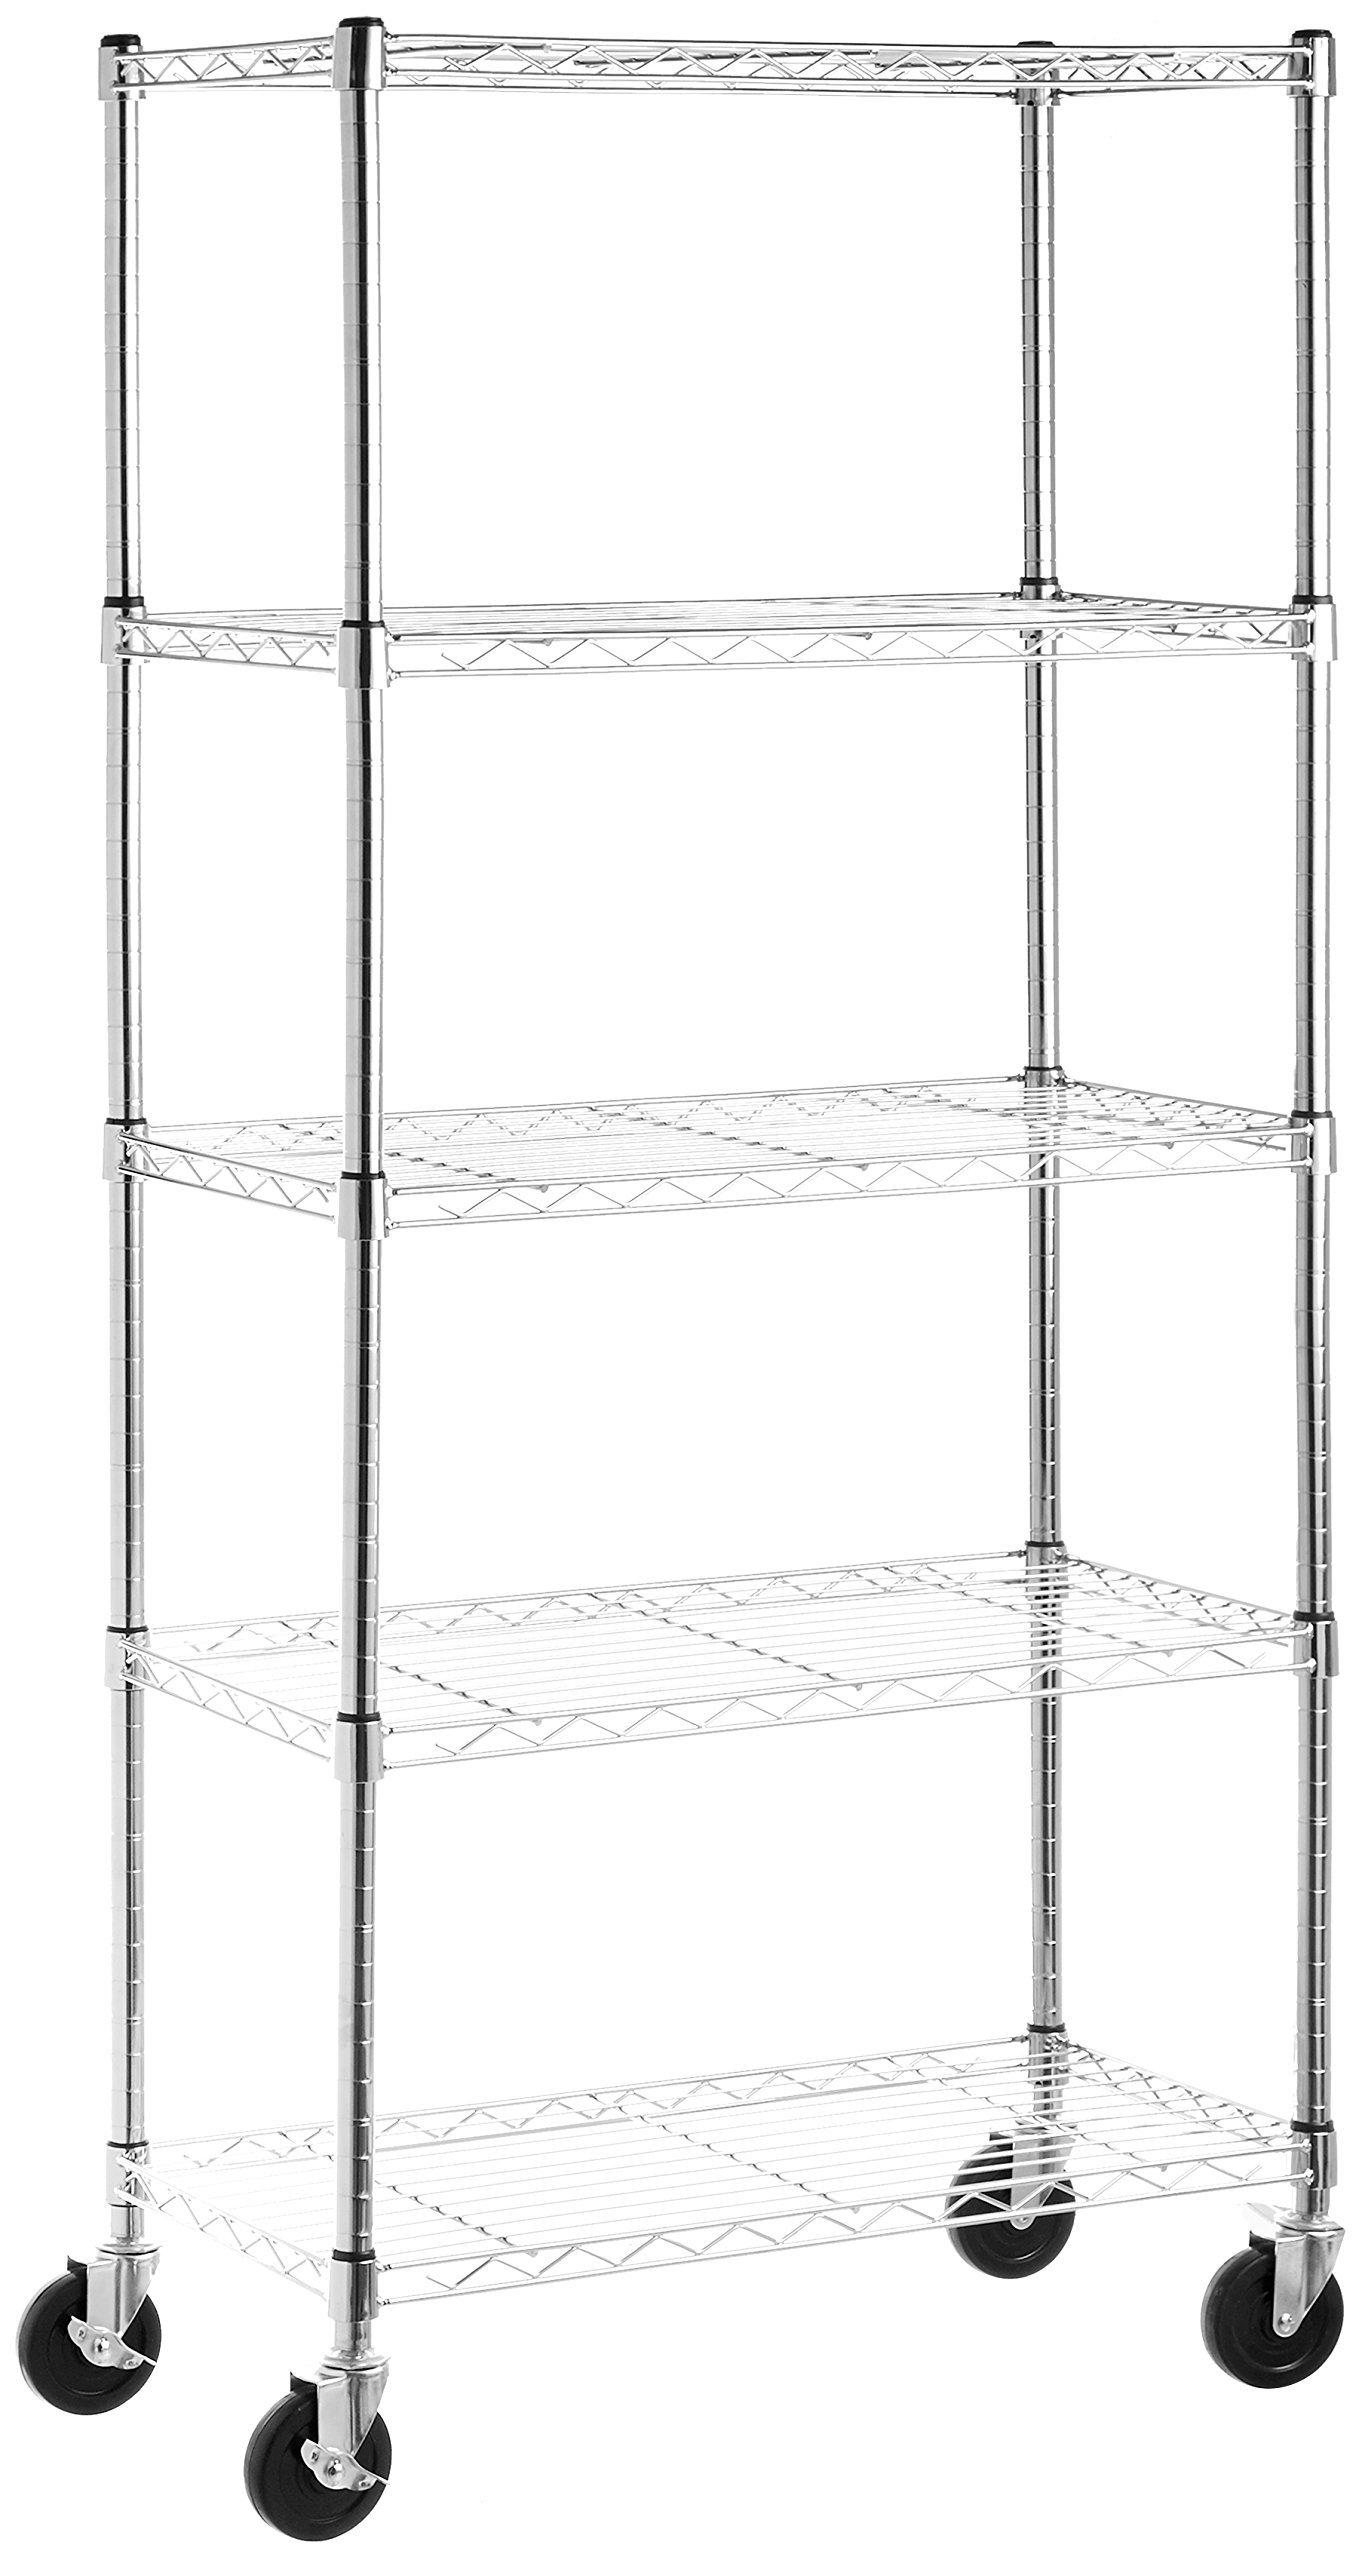 AmazonBasics 5-Shelf Shelving Unit on 4'' Casters, Chrome